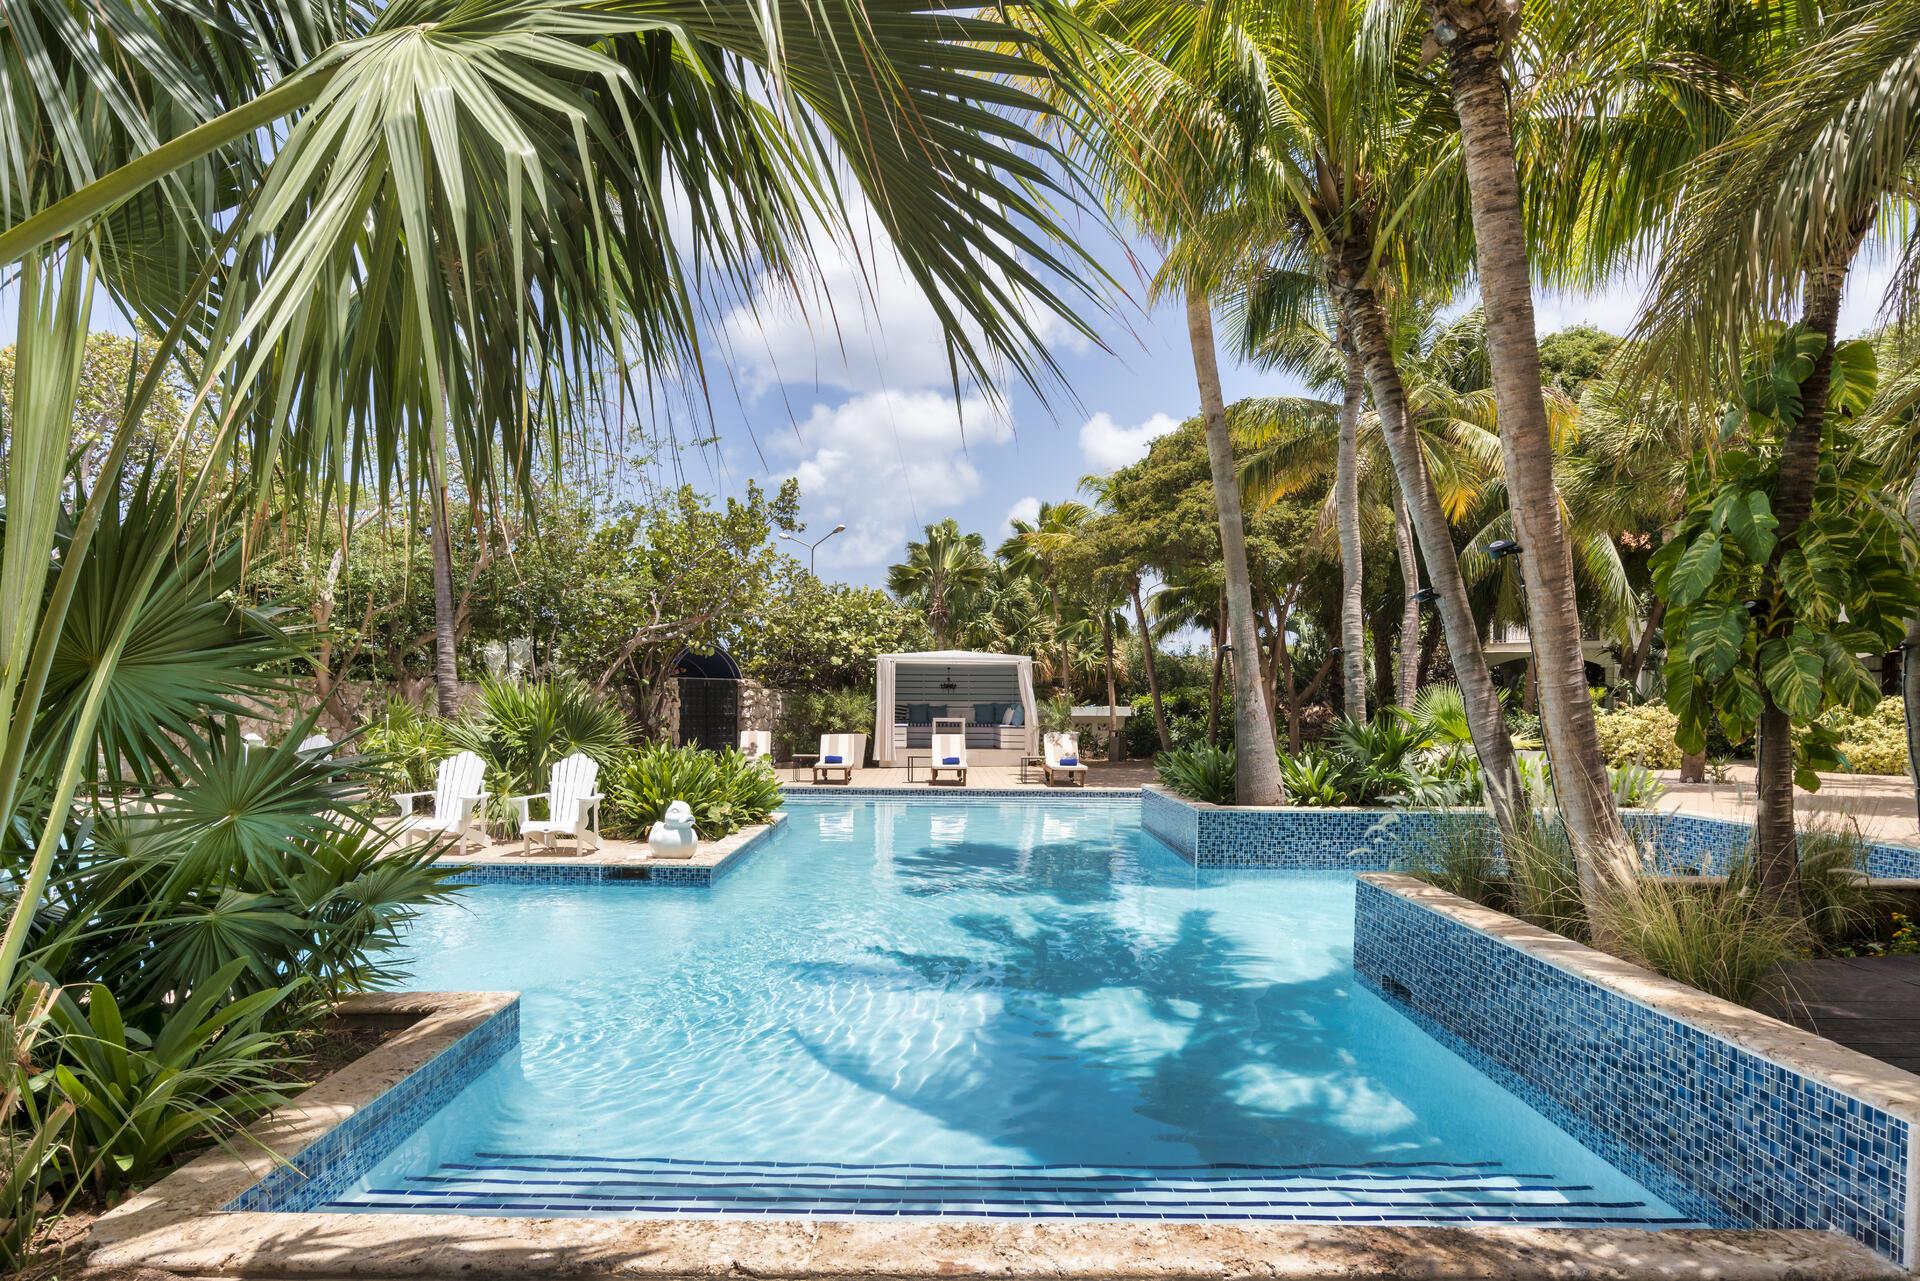 Floris Hotel's Pool